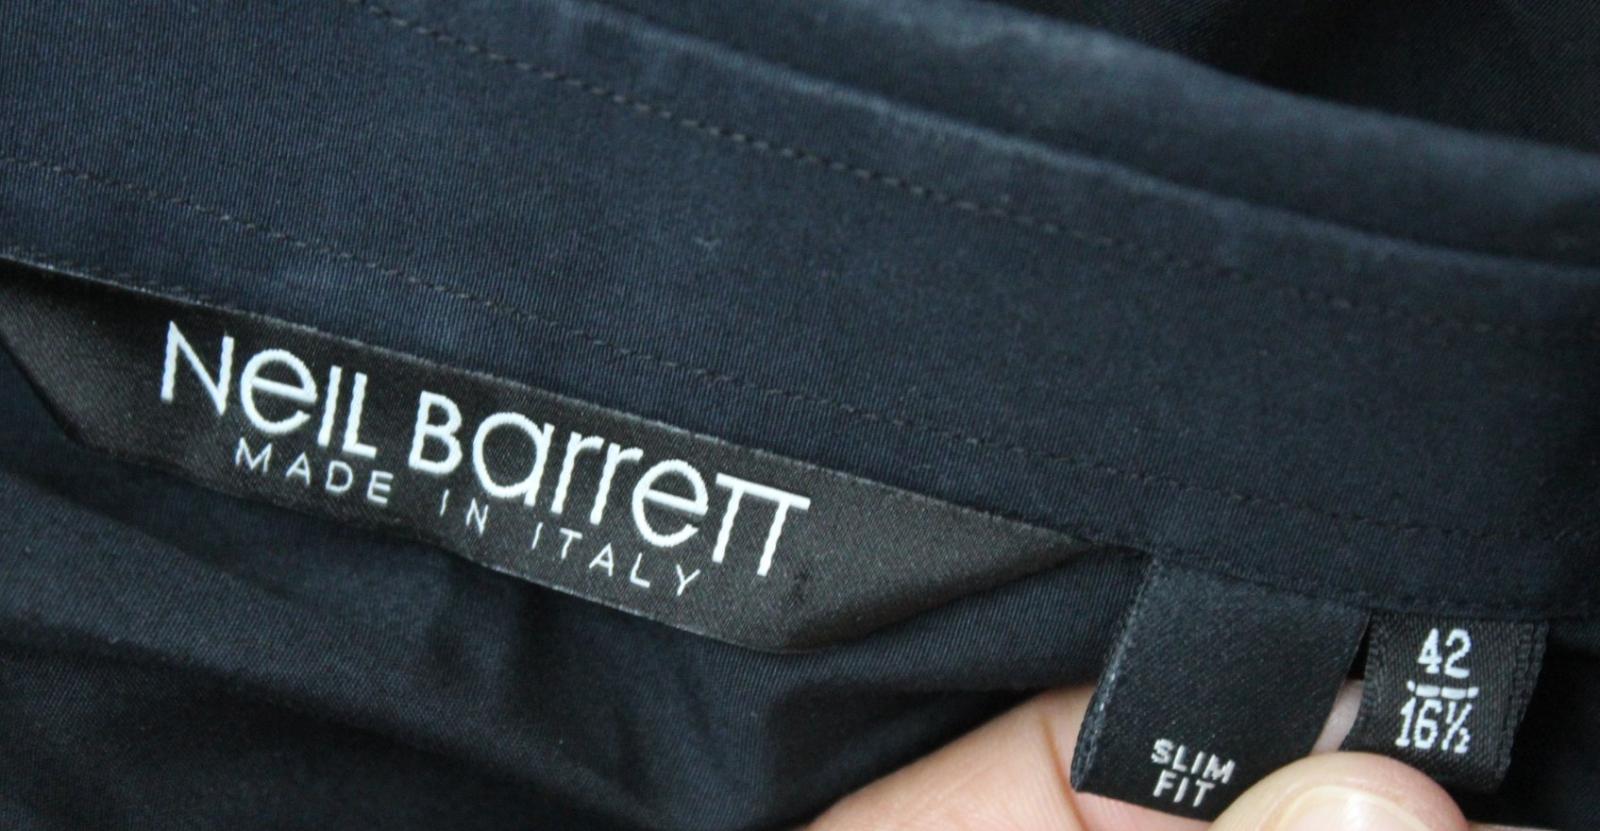 Neil-Barrett-Hombre-Azul-Manga-Negra-Cuello-Camisa-de-impresion-Corbata-Slim-Fit-16-5-034-42cm miniatura 8